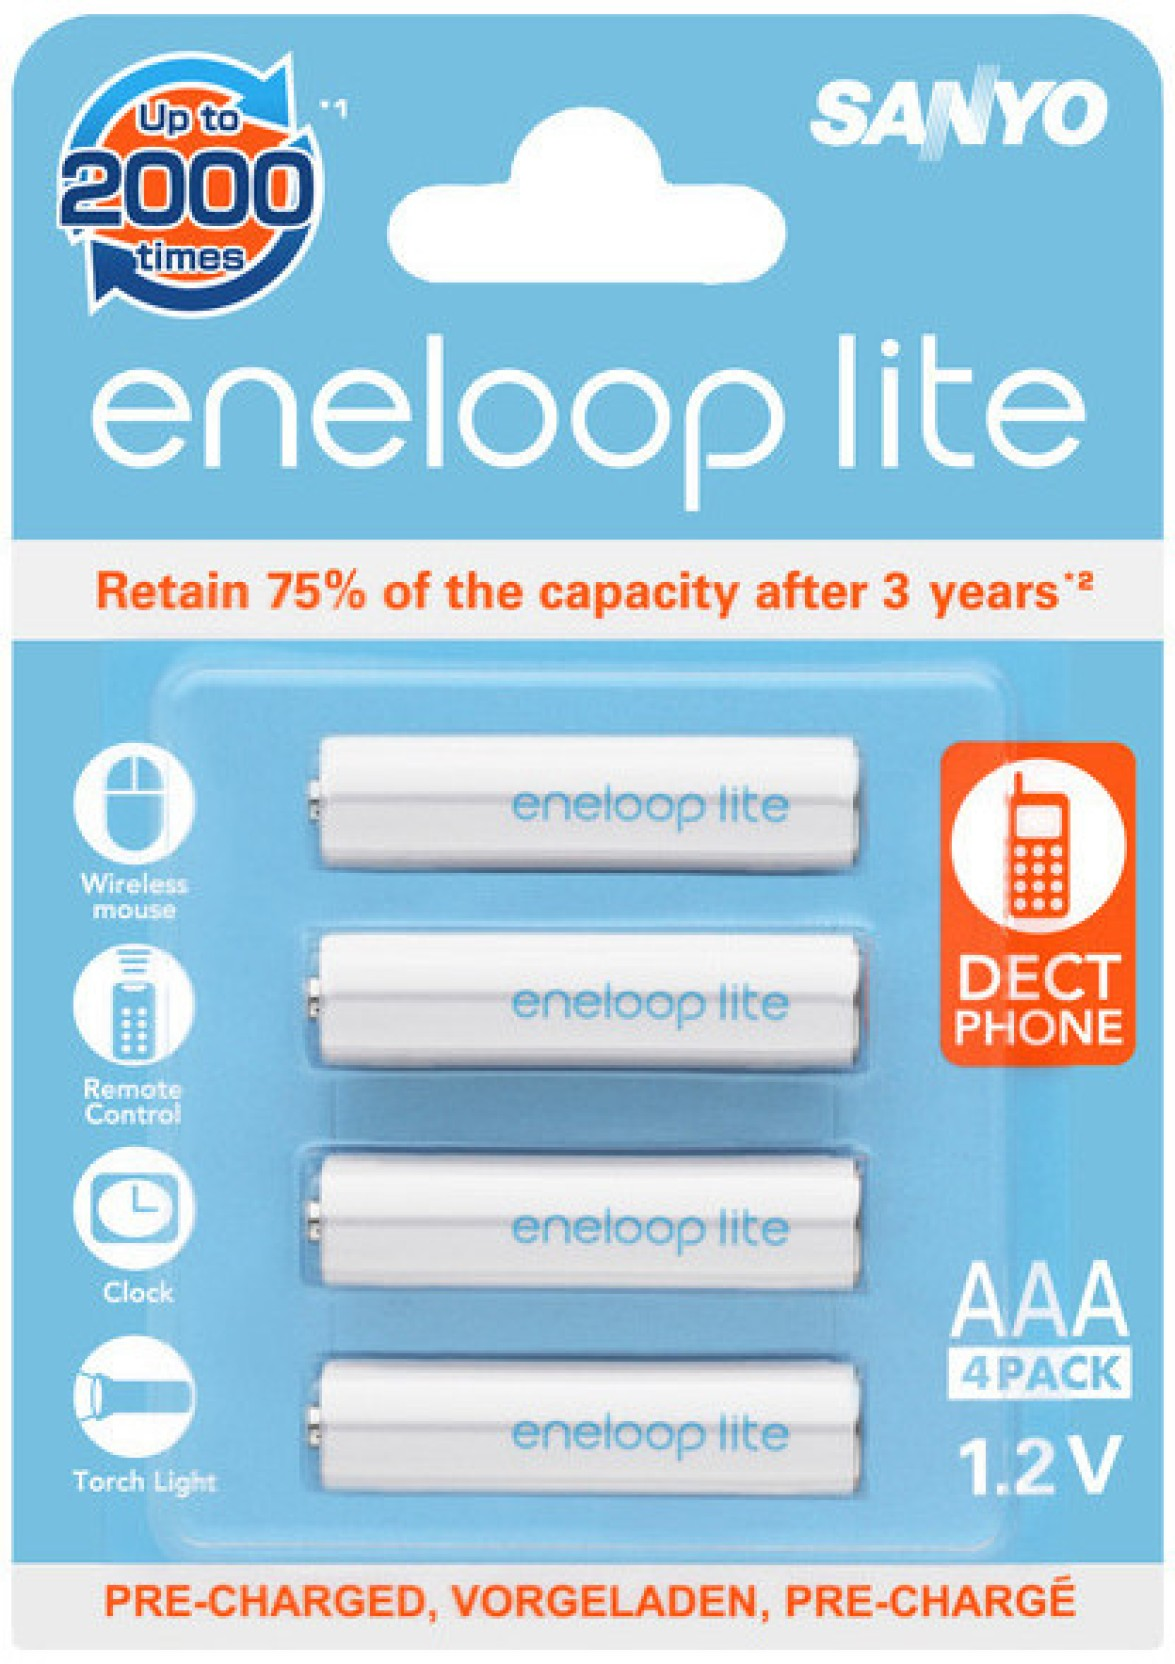 Sanyo Eneloop 4hr 4uq Secp C Battery Aa 2pcs Share